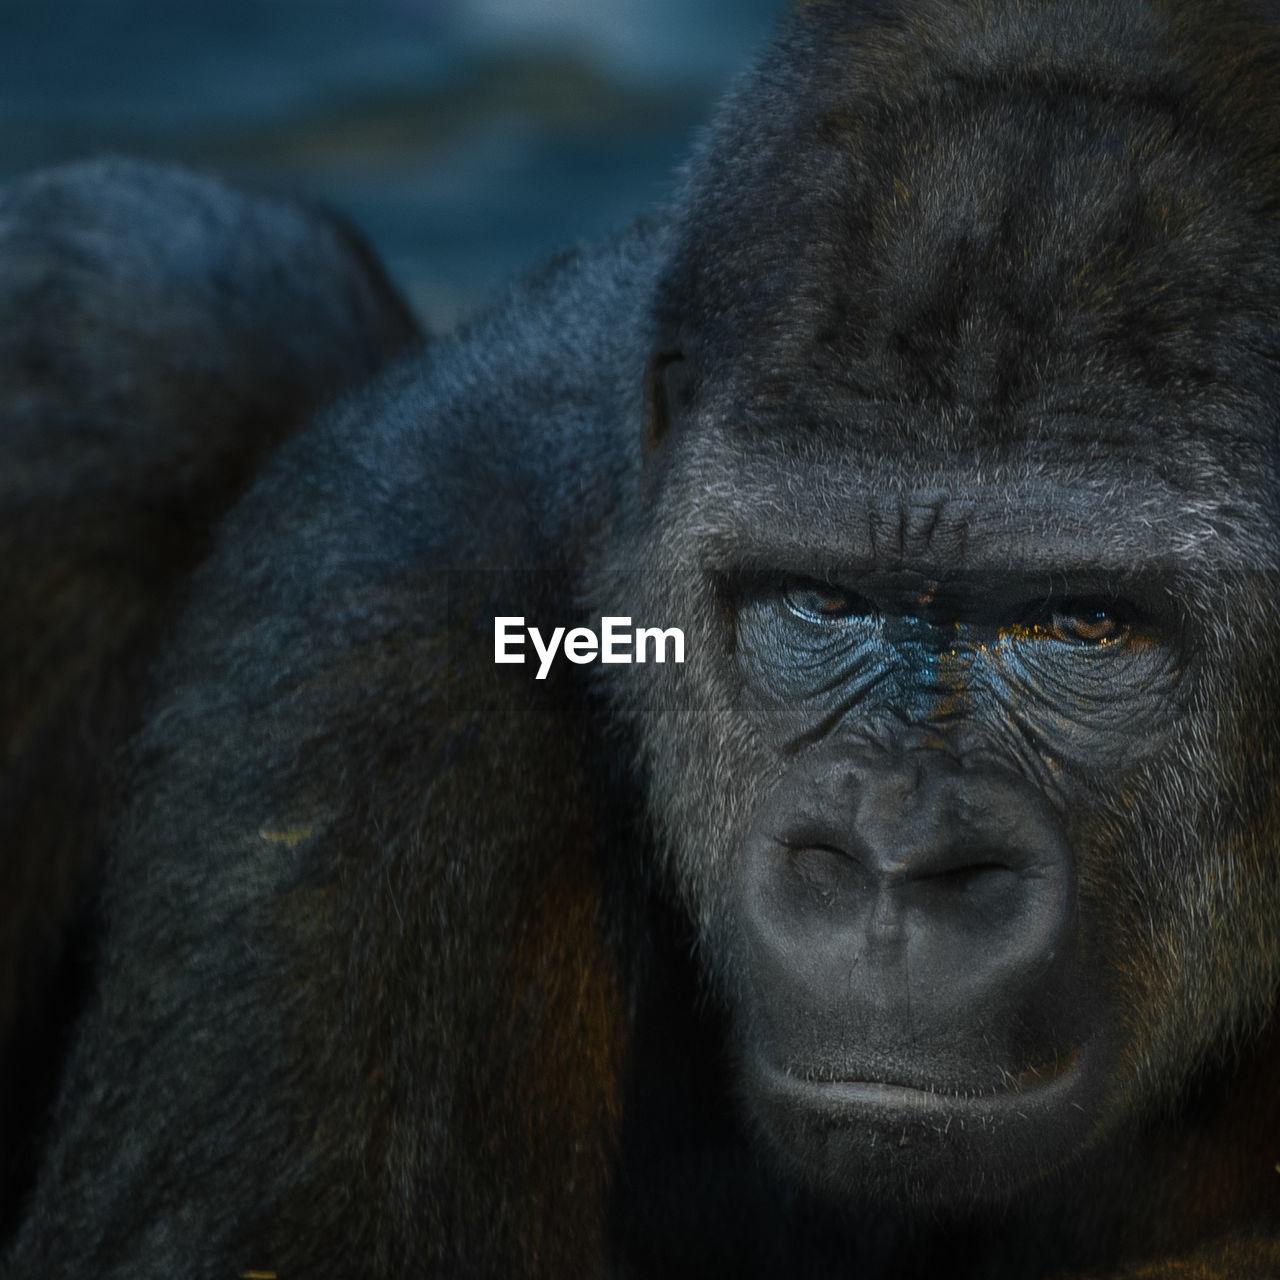 Portrait of gorilla at zoo